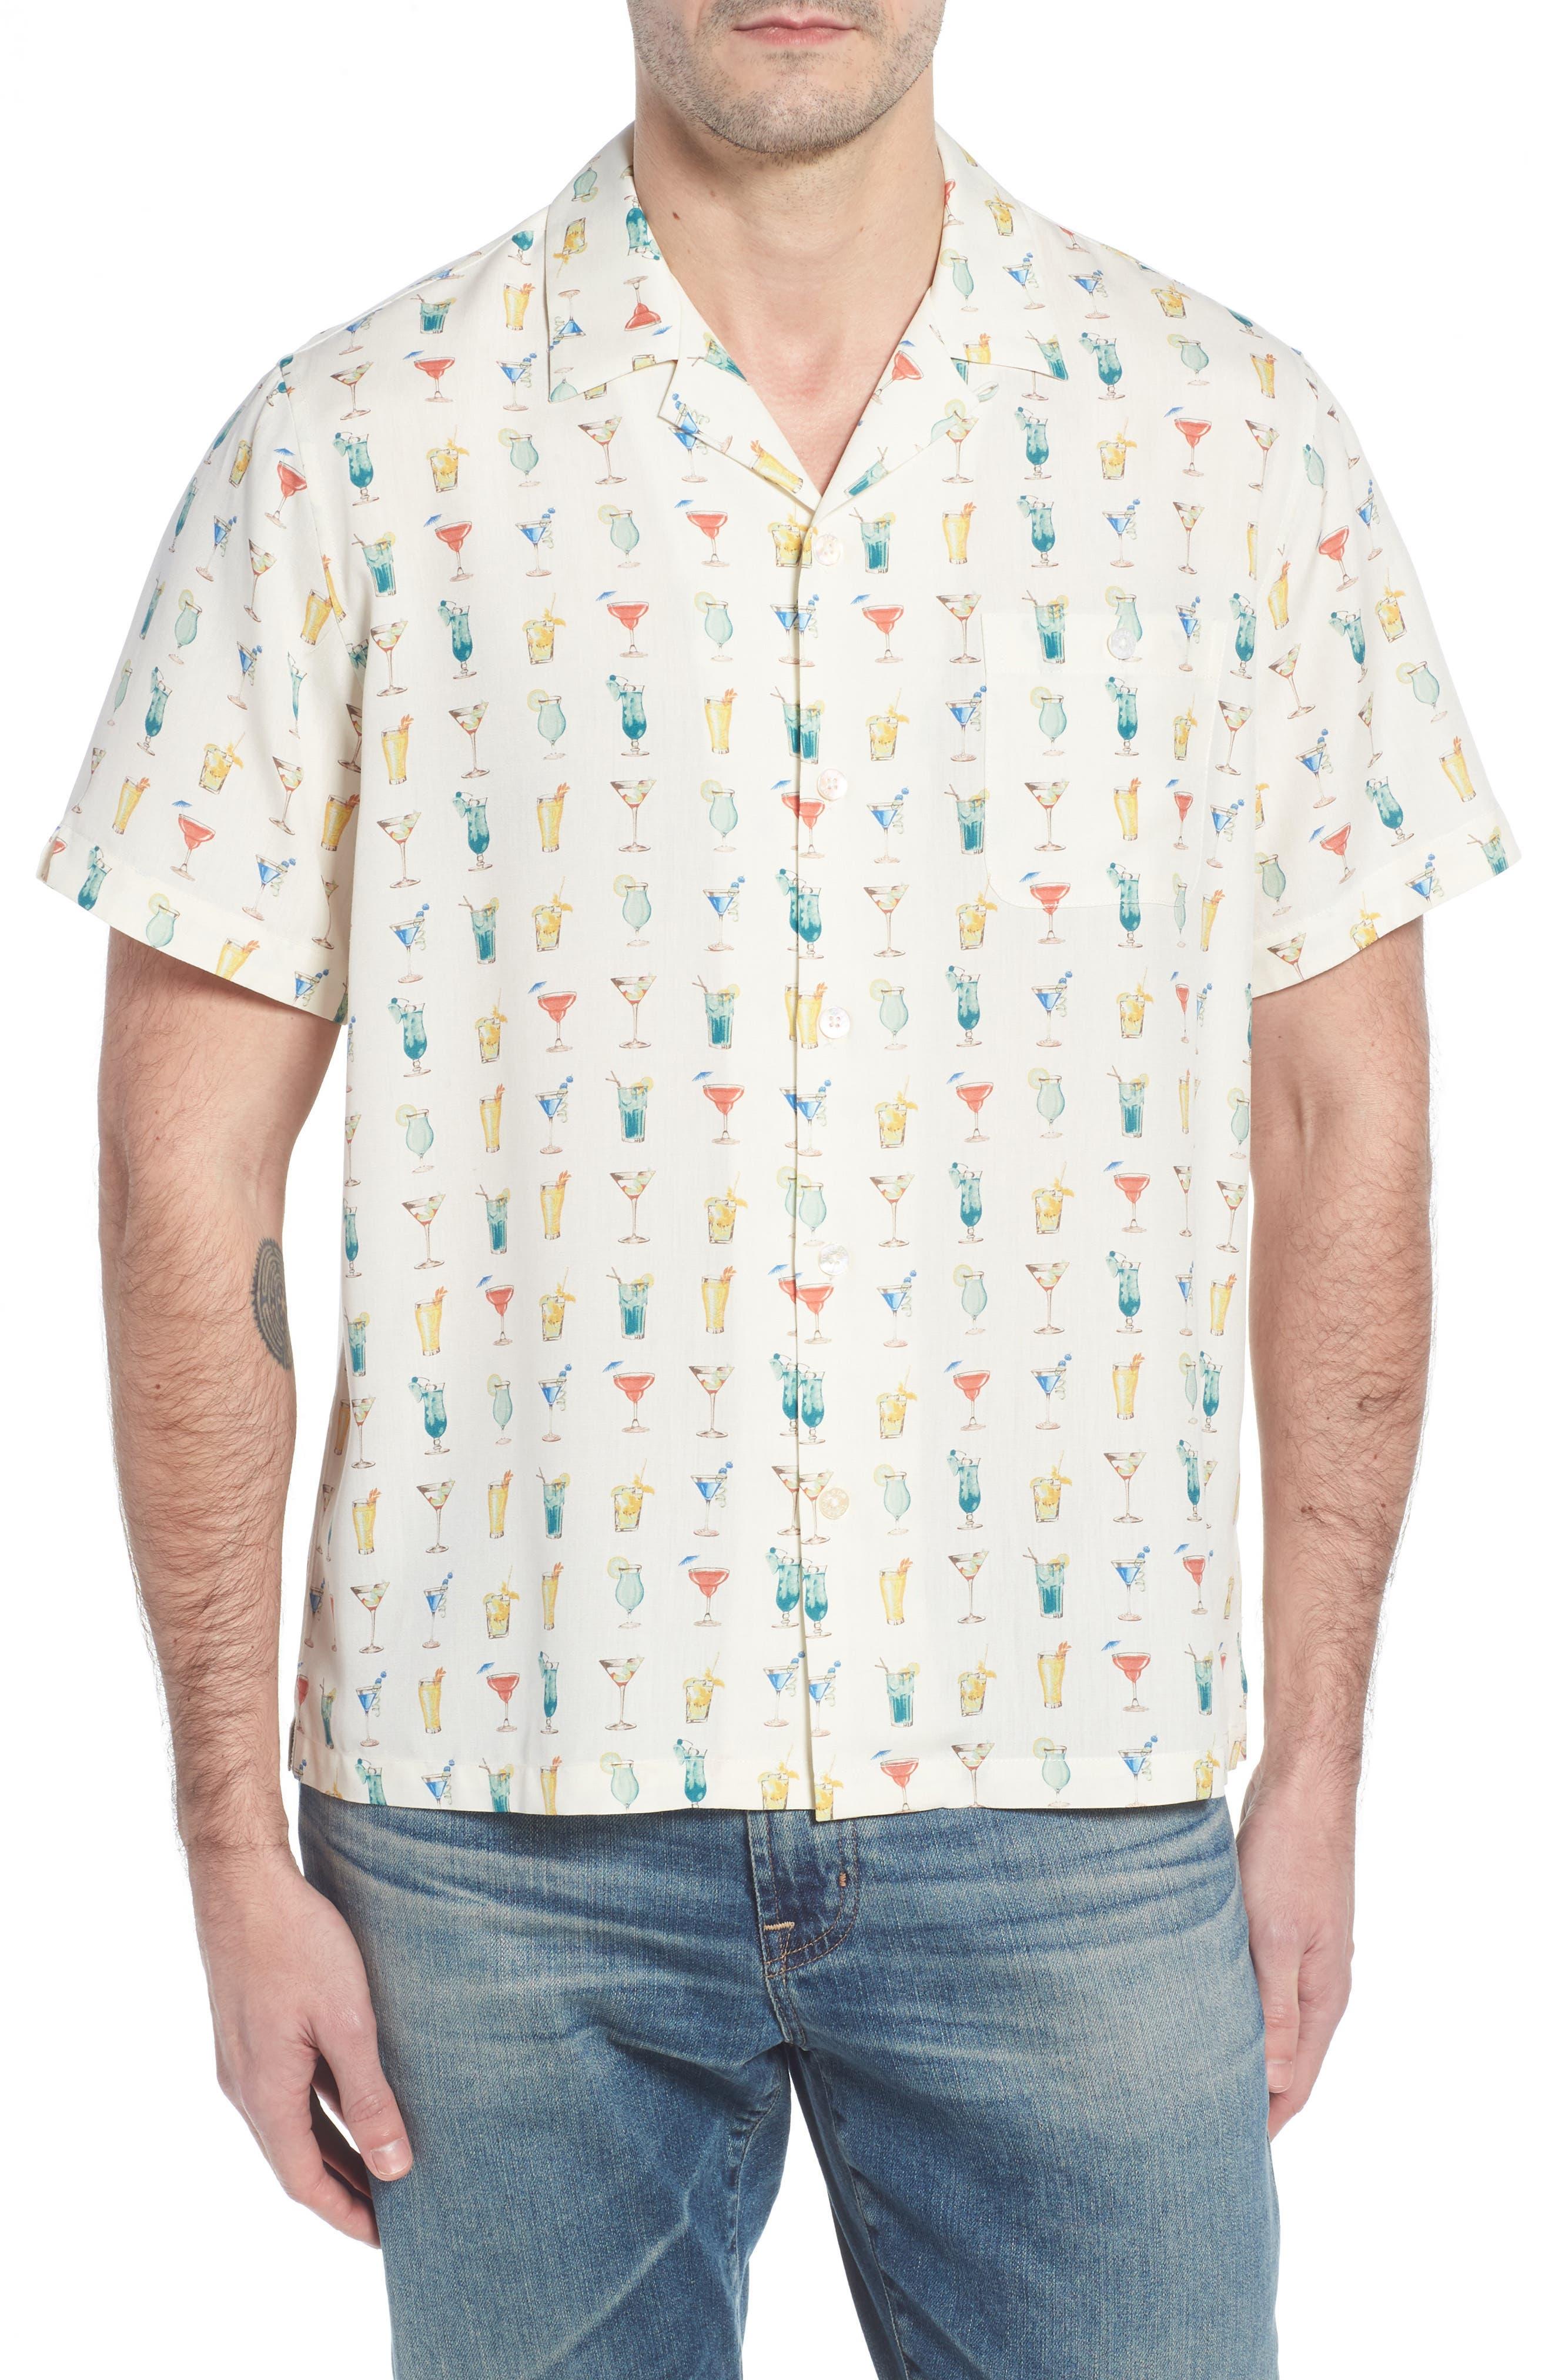 Mixalot Trim Fit Silk Blend Camp Shirt,                             Main thumbnail 1, color,                             Off White